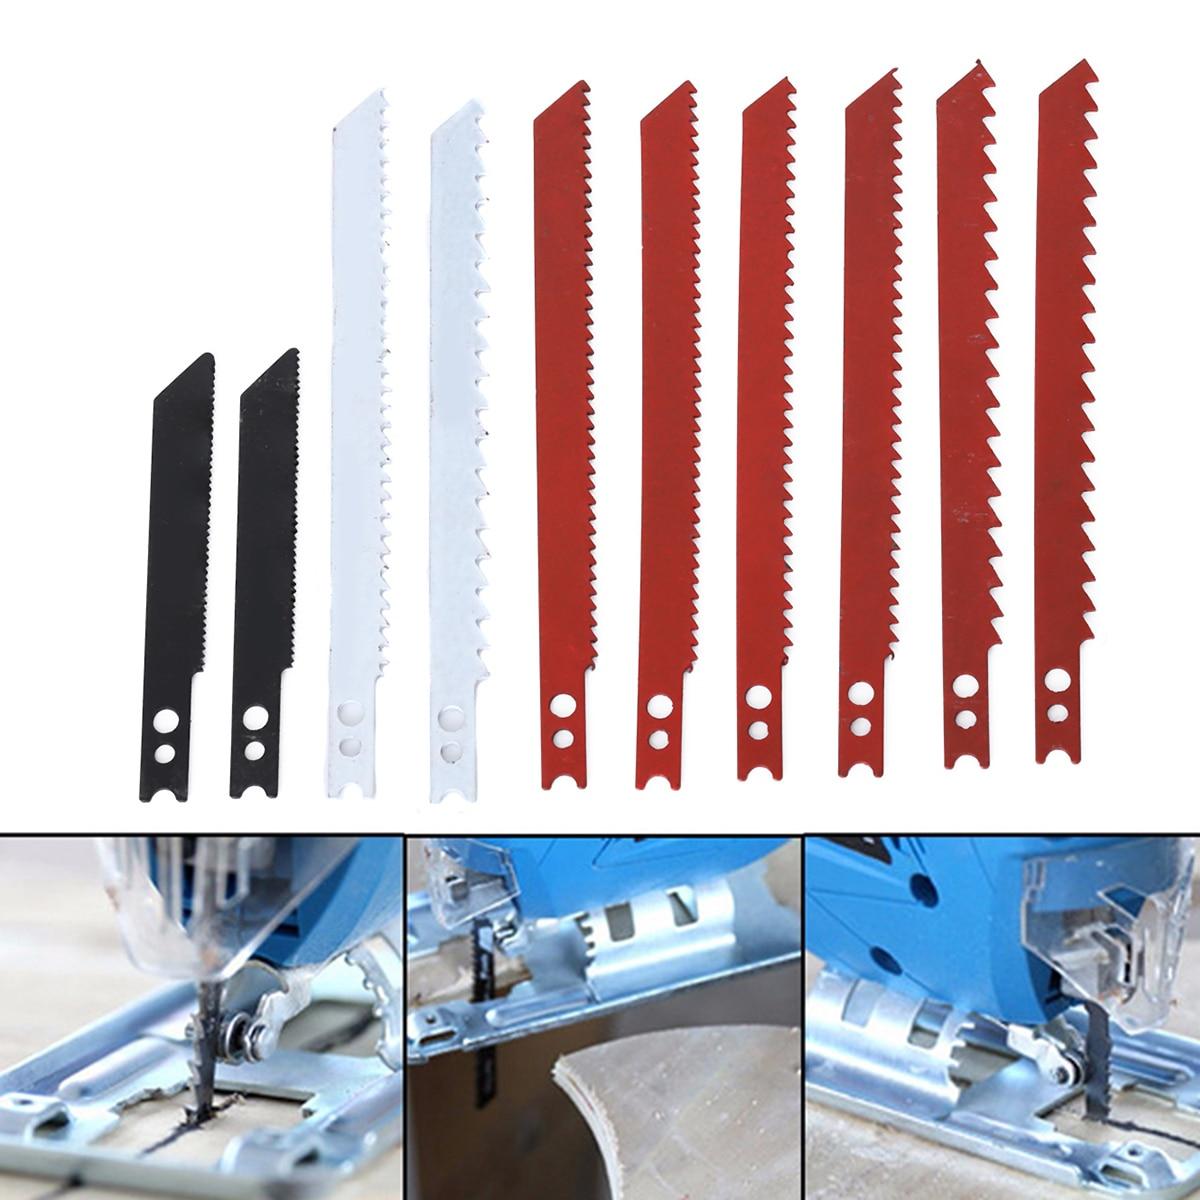 10pcs Durable Jigsaw Blades 60/97mm Jig Saw Blades Set For Cutting Metal Plastic Wood Power Tools